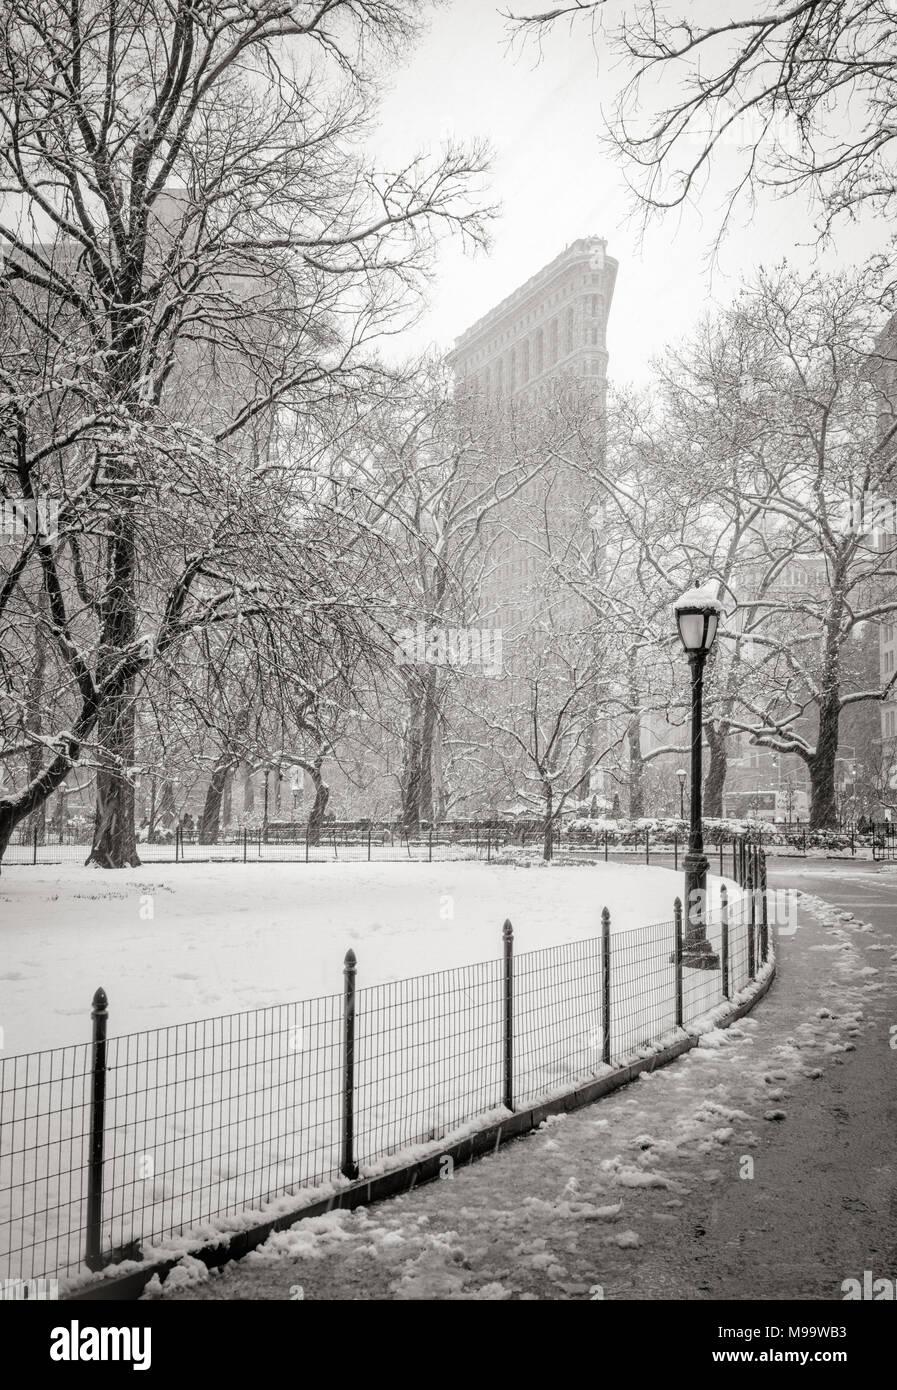 New York City, NY, Stati Uniti d'America - 21 Marzo 2018: Flatiron Building dal Madison Square Park con nevicata. (Bianco e nero) Flatiron District, Manhattan Foto Stock